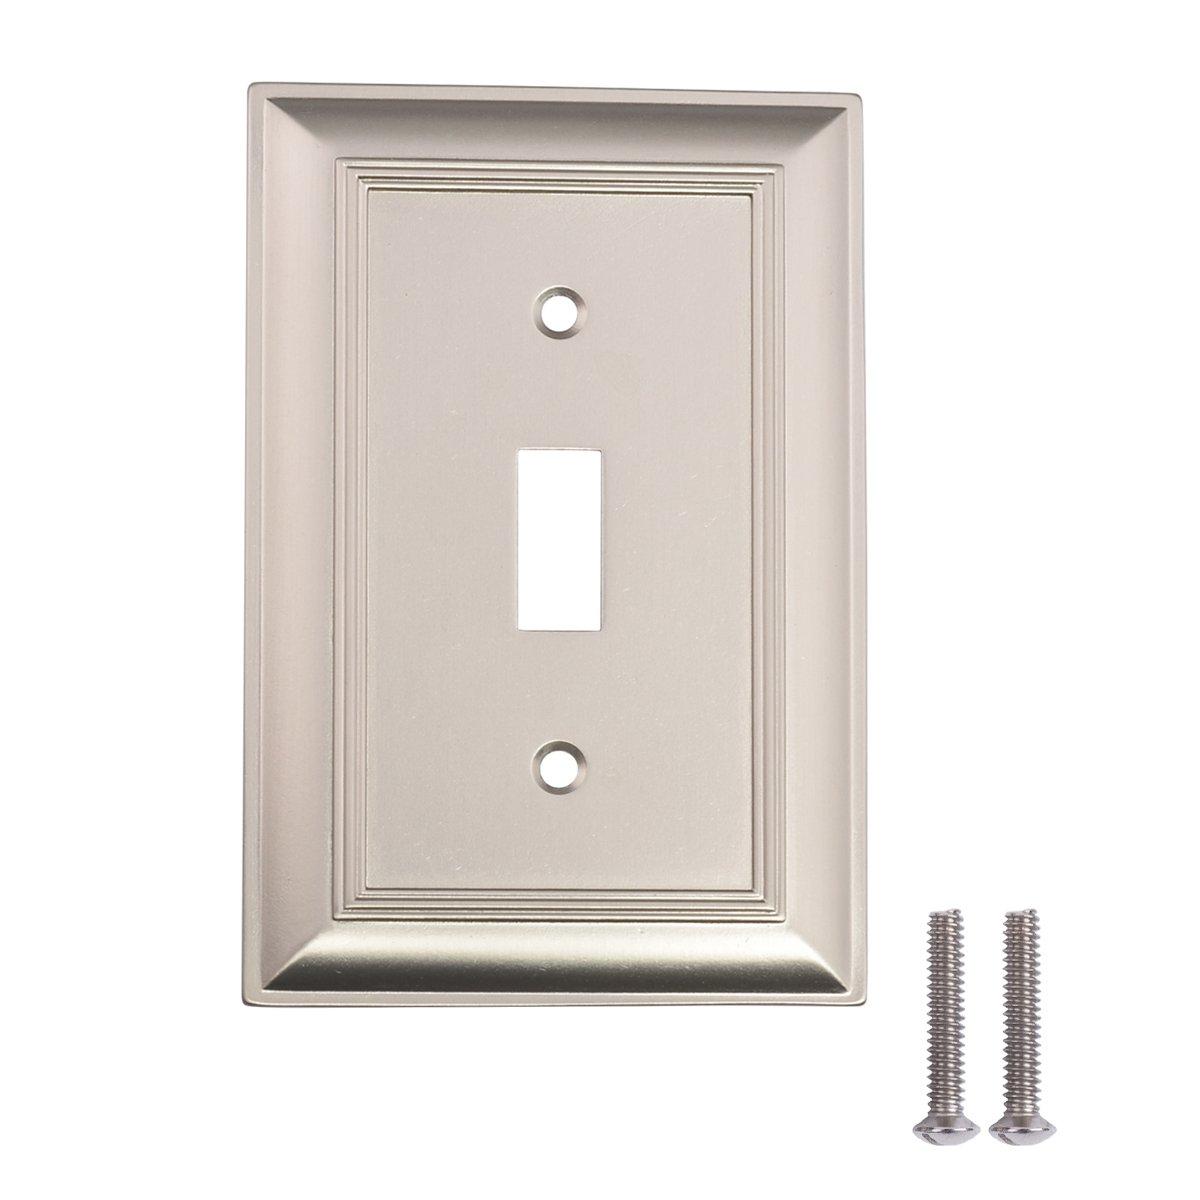 AmazonBasics Single Toggle Wall Plate, Satin Nickel, 3-Pack